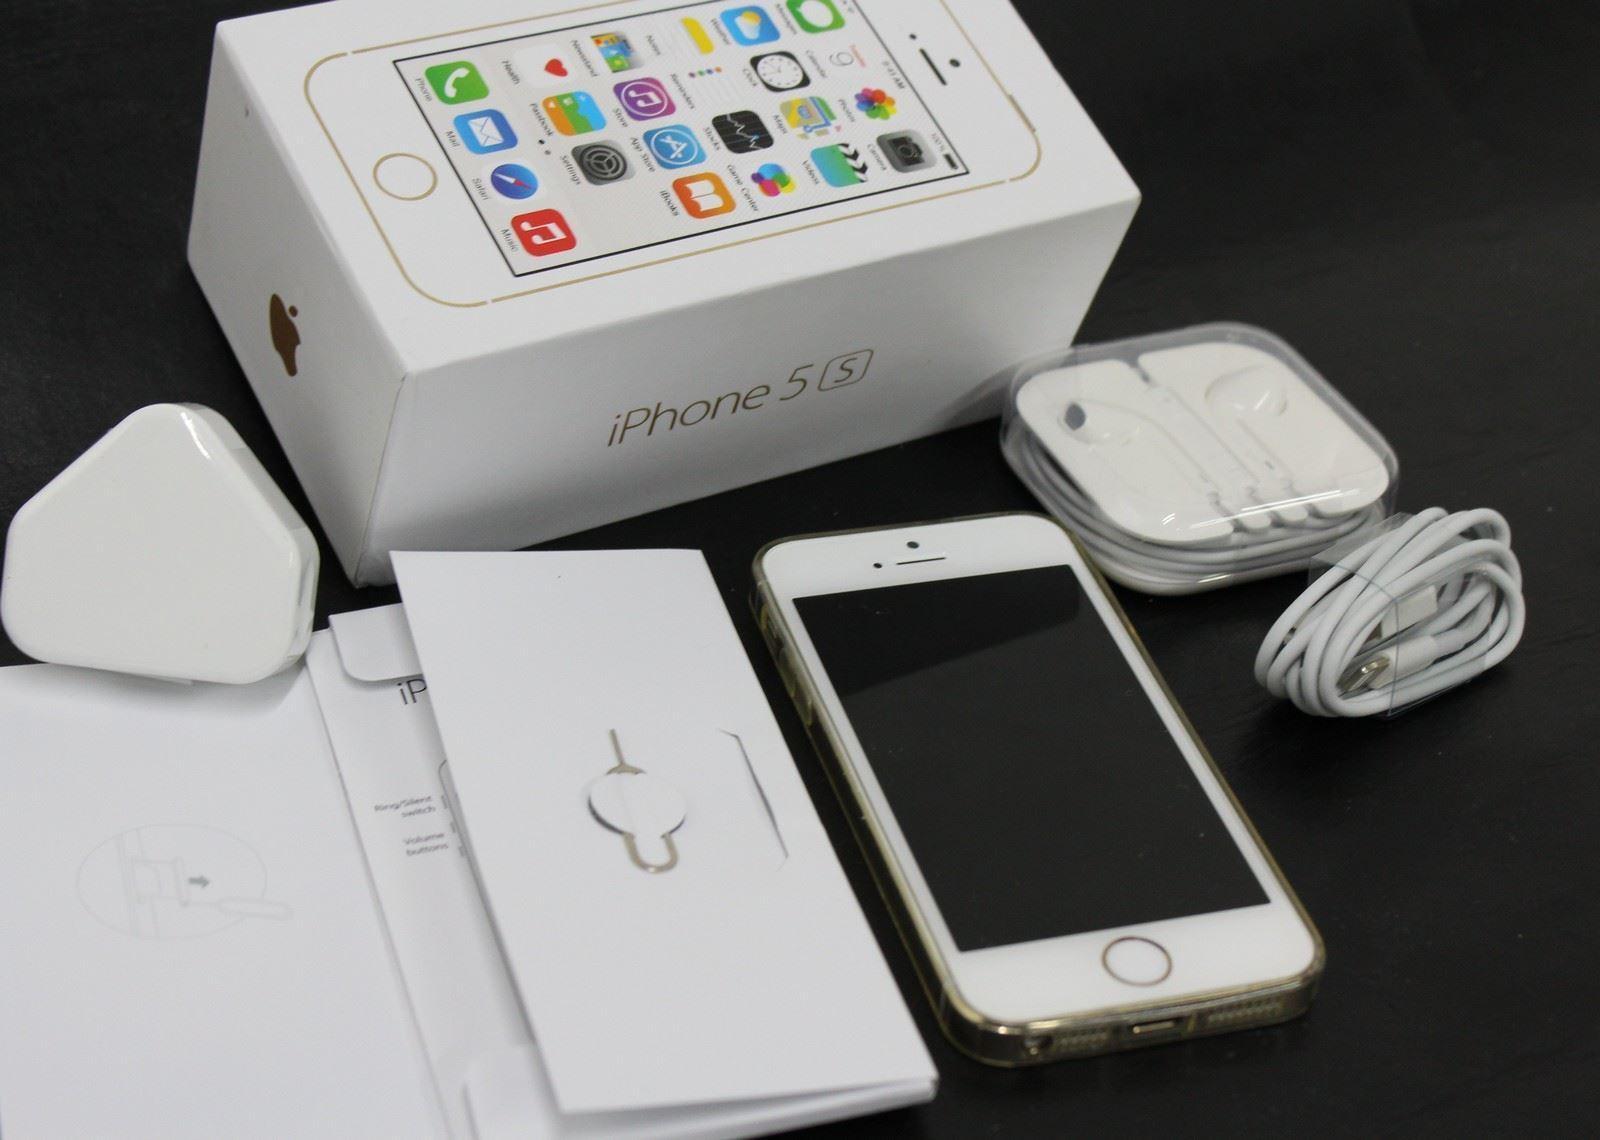 Ap apple iphone 5s space gray 32gb - Apple Iphone 5s 32gb 64gb Space Grey Smartphone